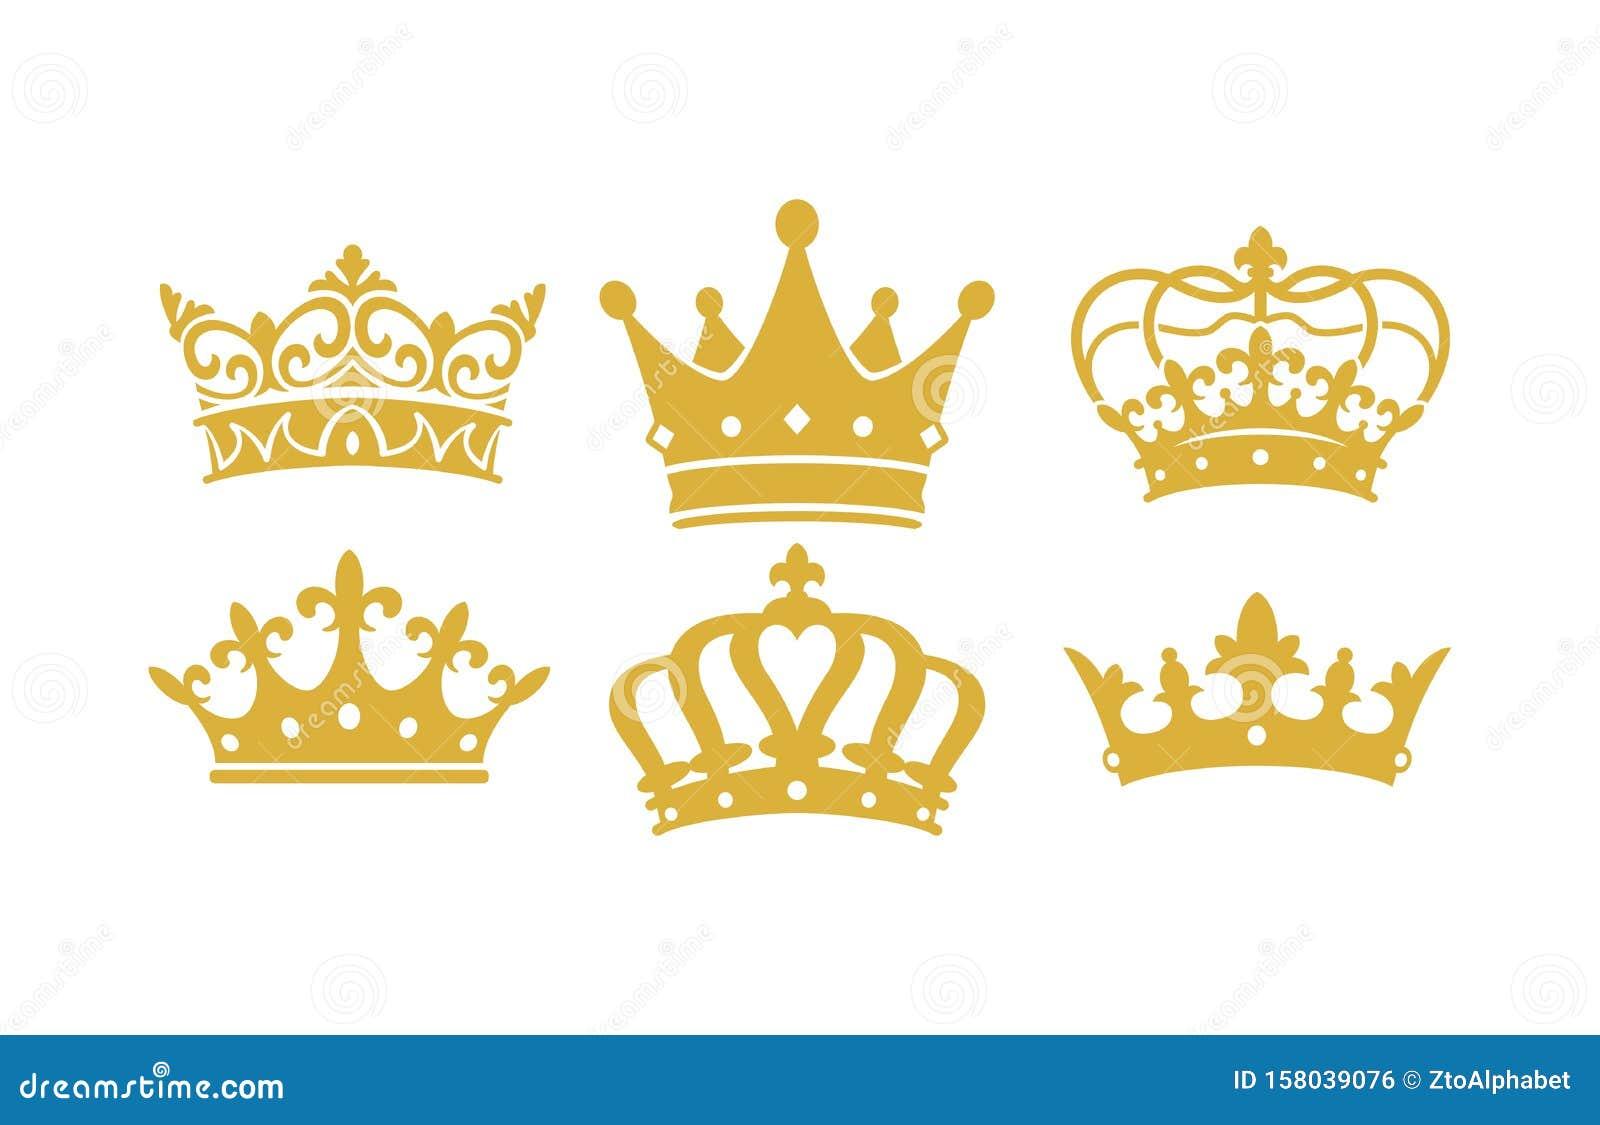 King Queen Crown Vectors Stock Vector Illustration Of Style 158039076